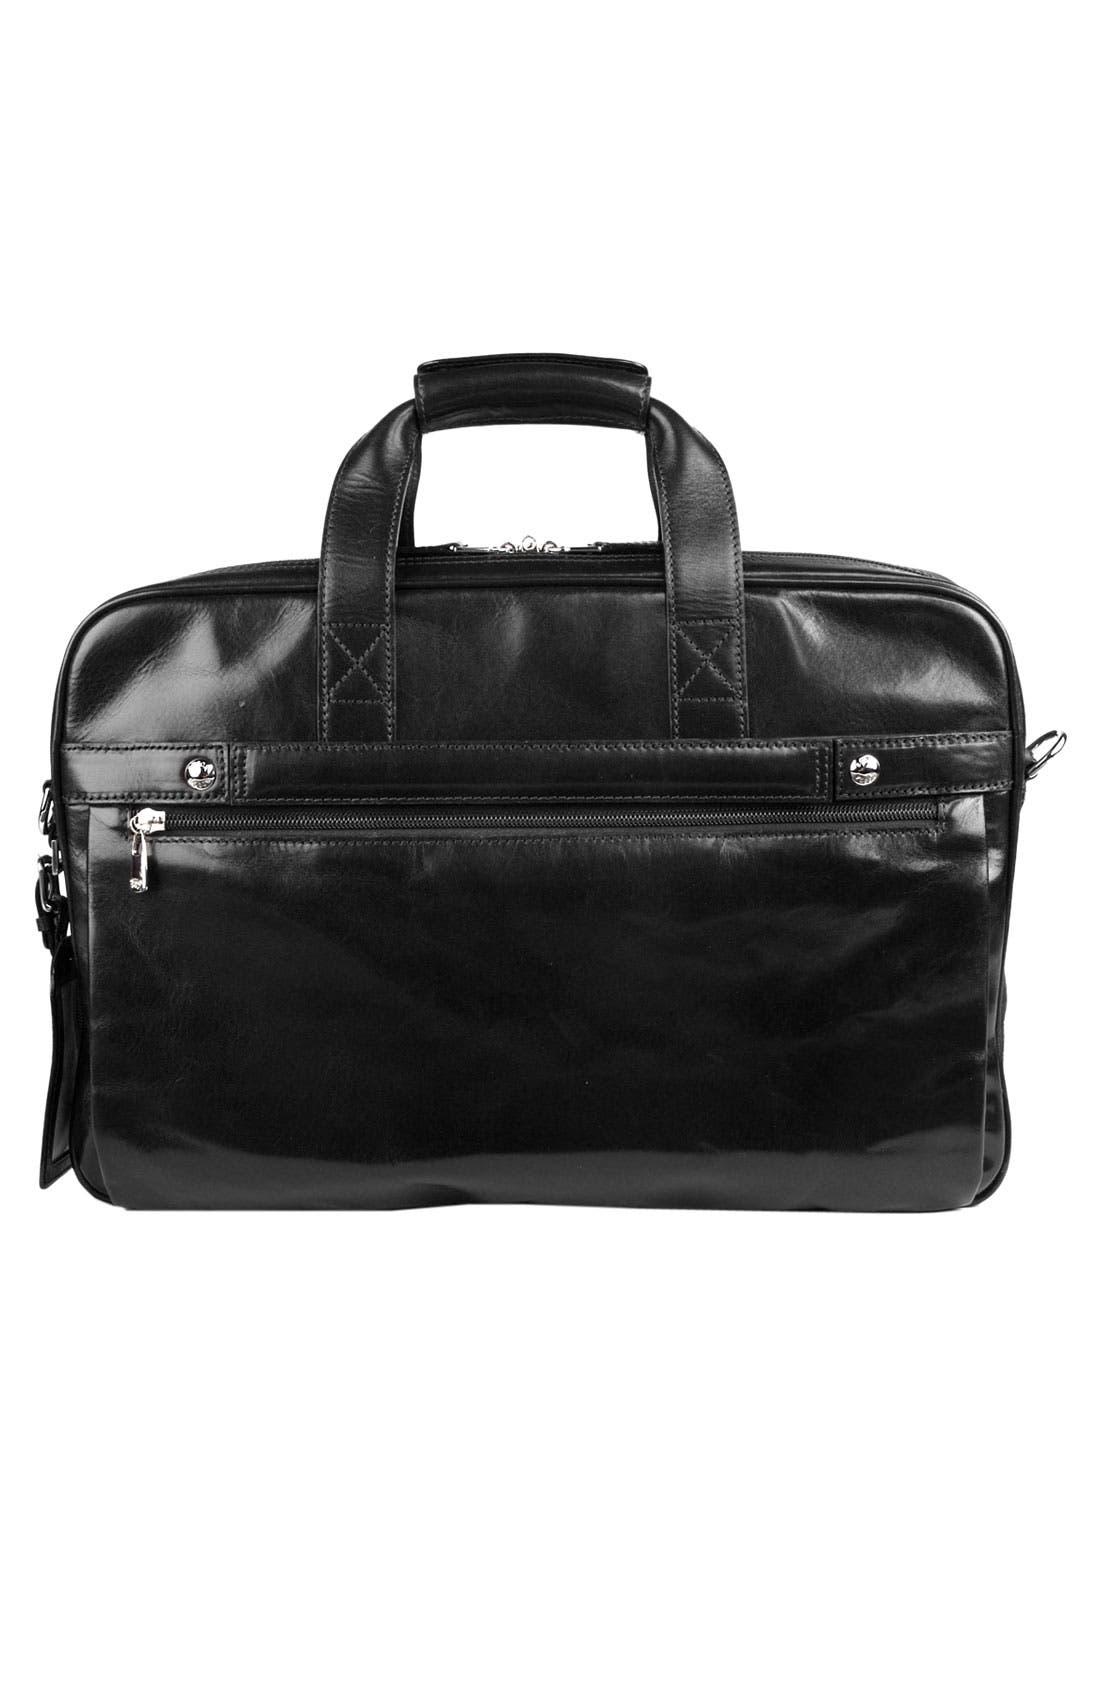 Double Compartment Leather Briefcase,                             Alternate thumbnail 2, color,                             Black